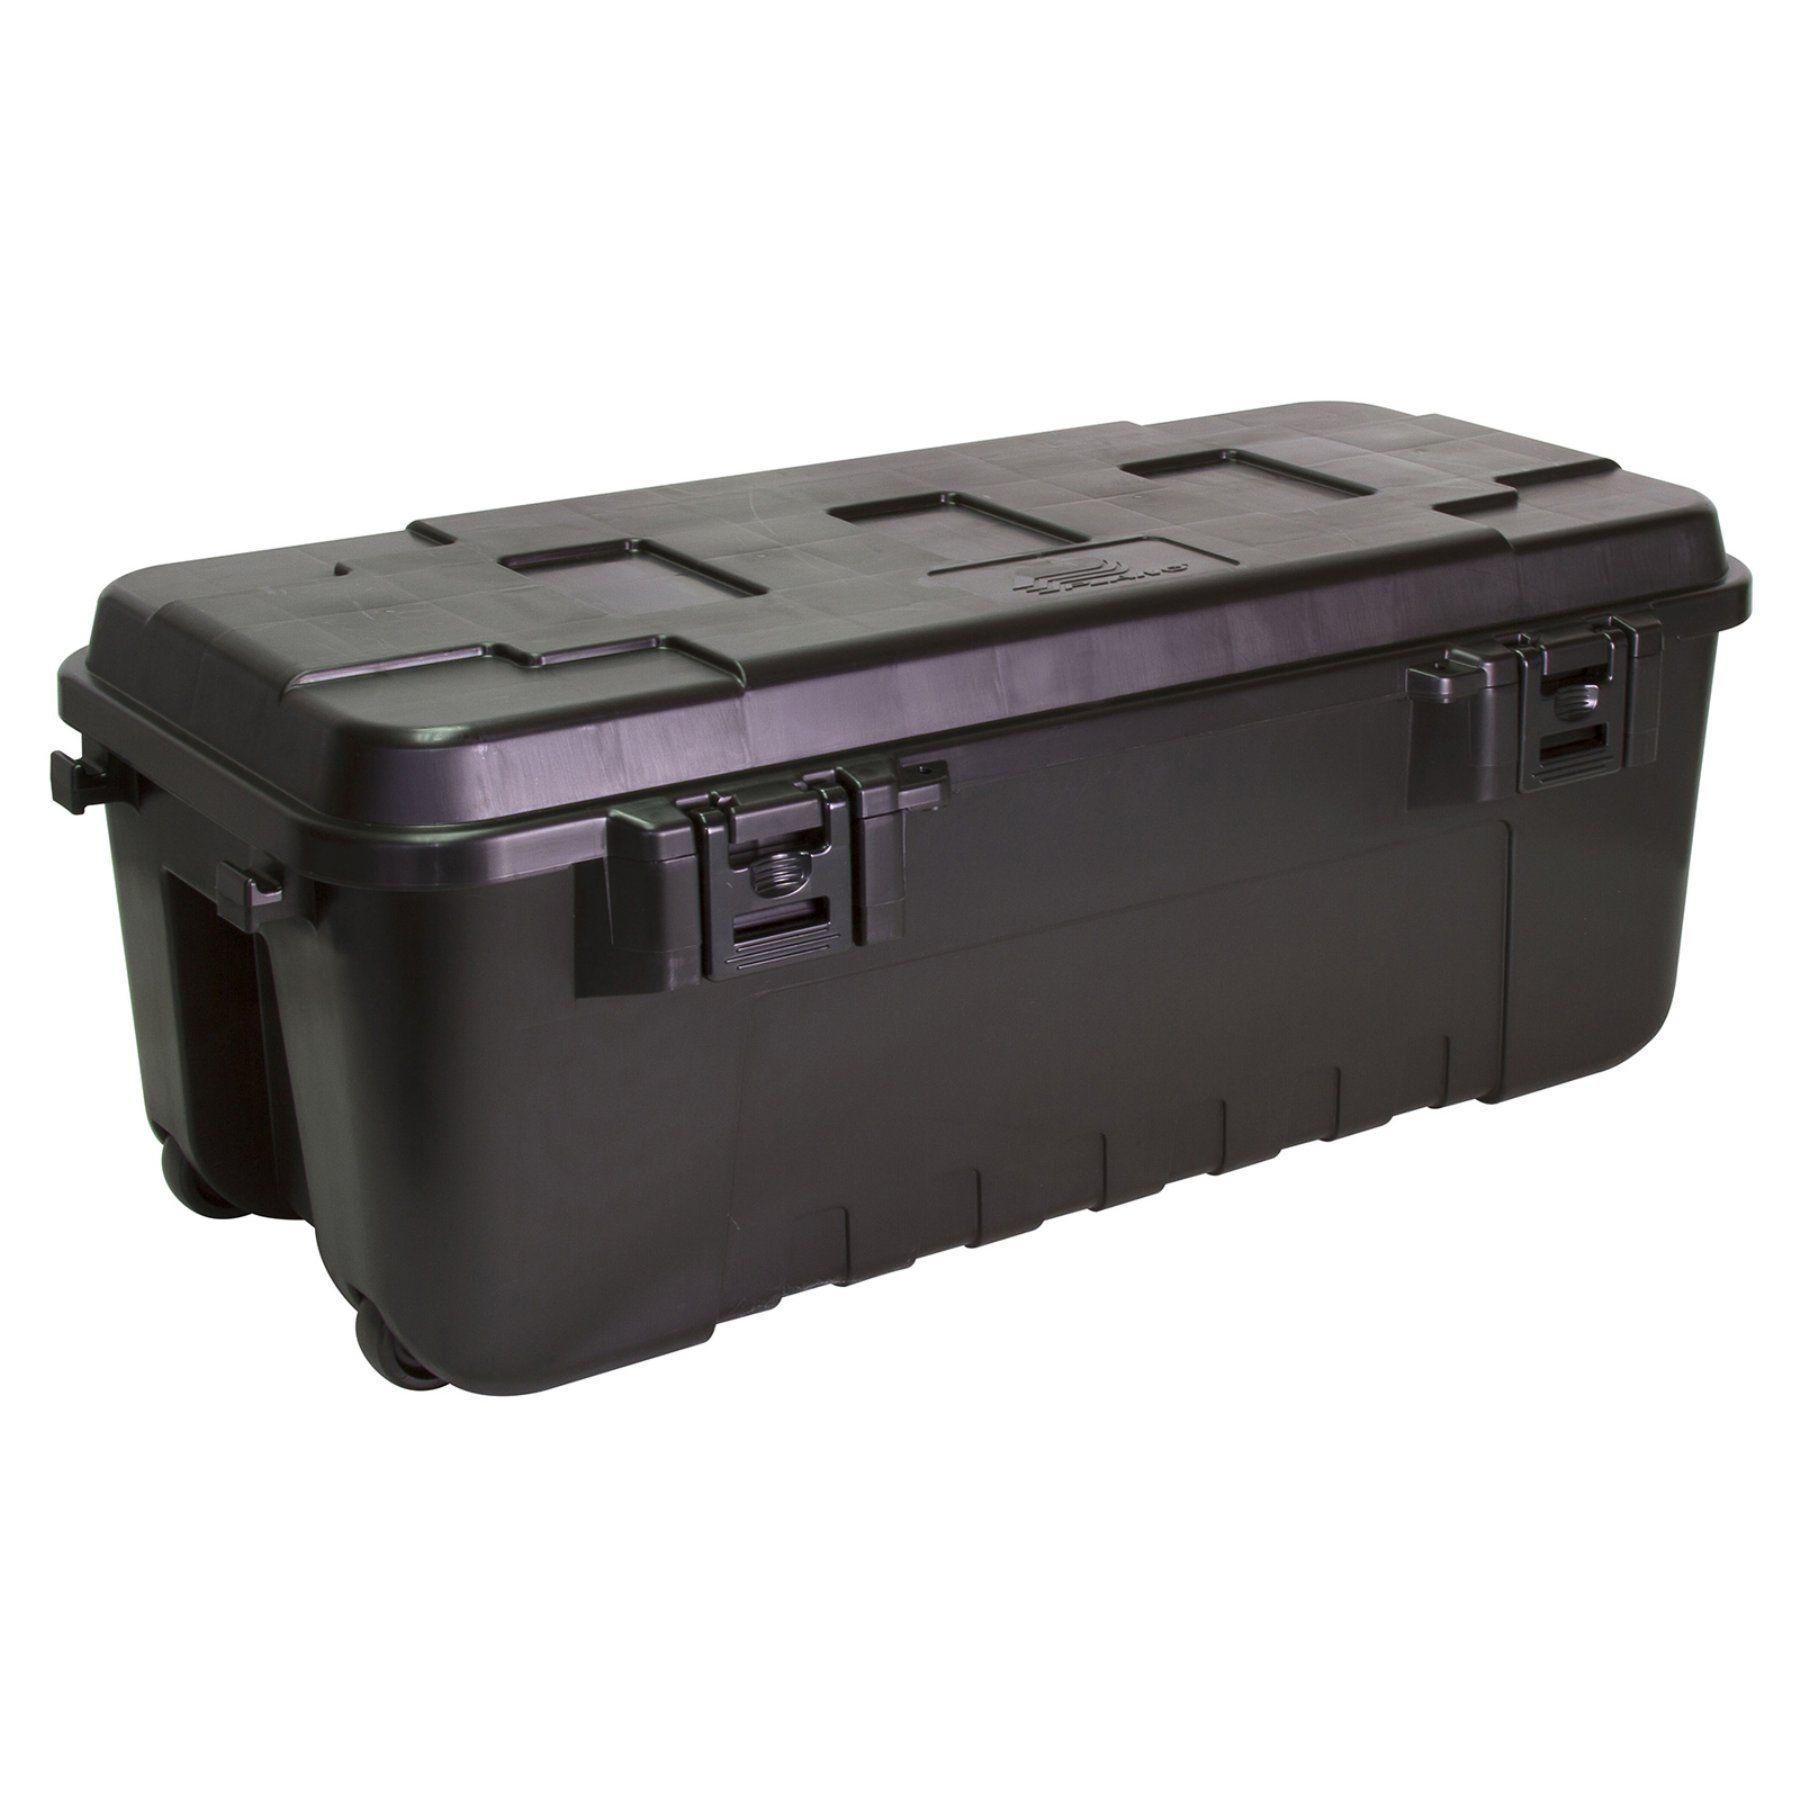 Plano Quart Black Storage Trunk 21941885 Storage trunk